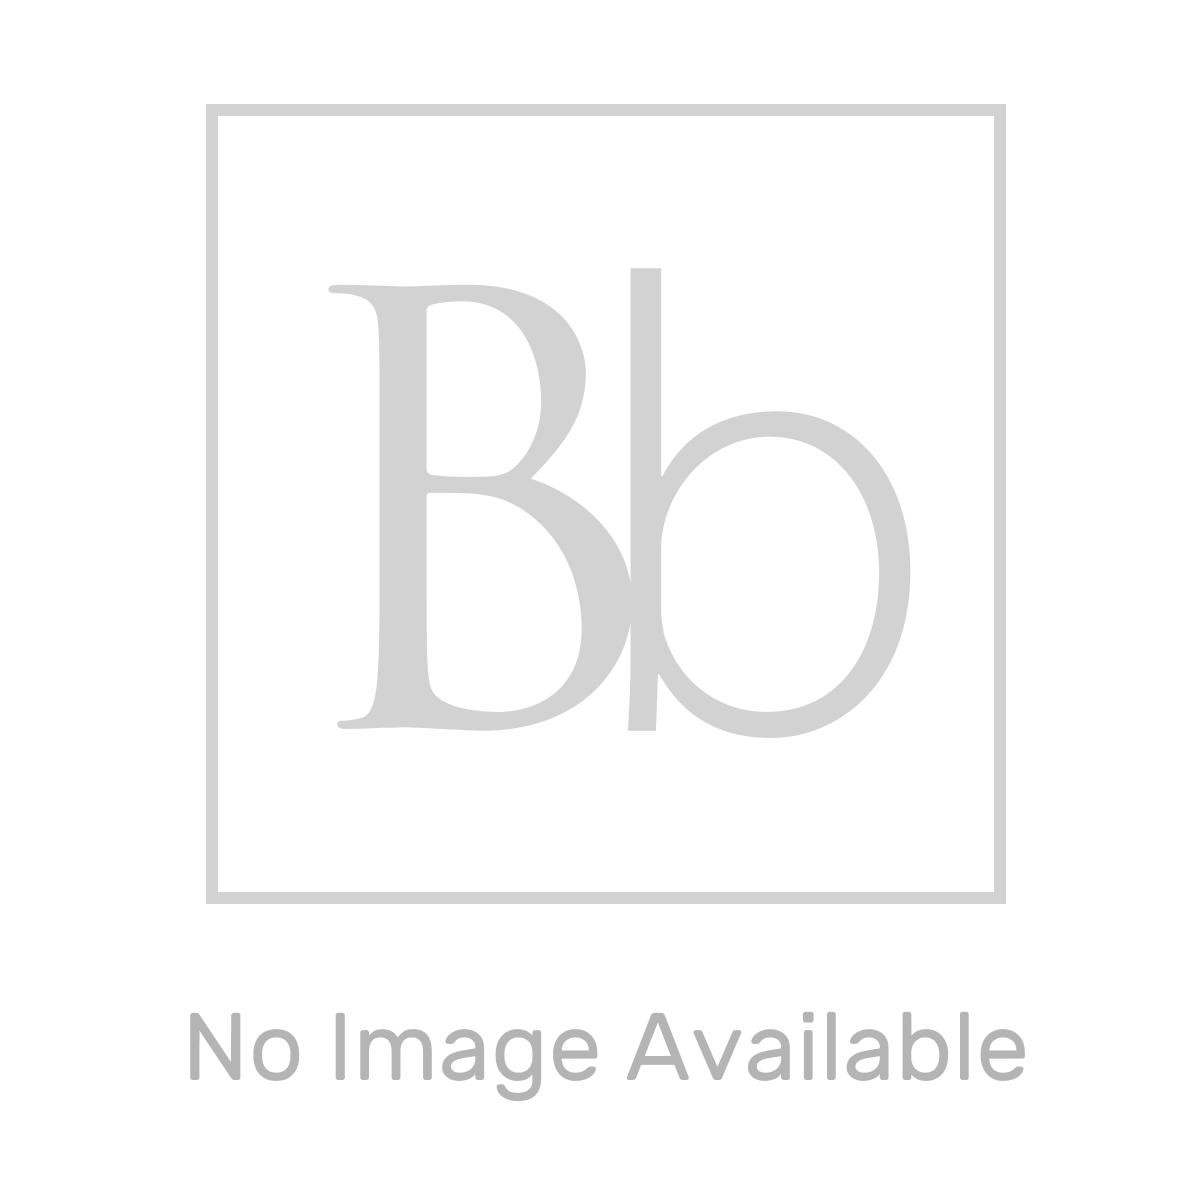 Elation Sendai Stone Grey Grain Framed Mirror 450mm Measurements